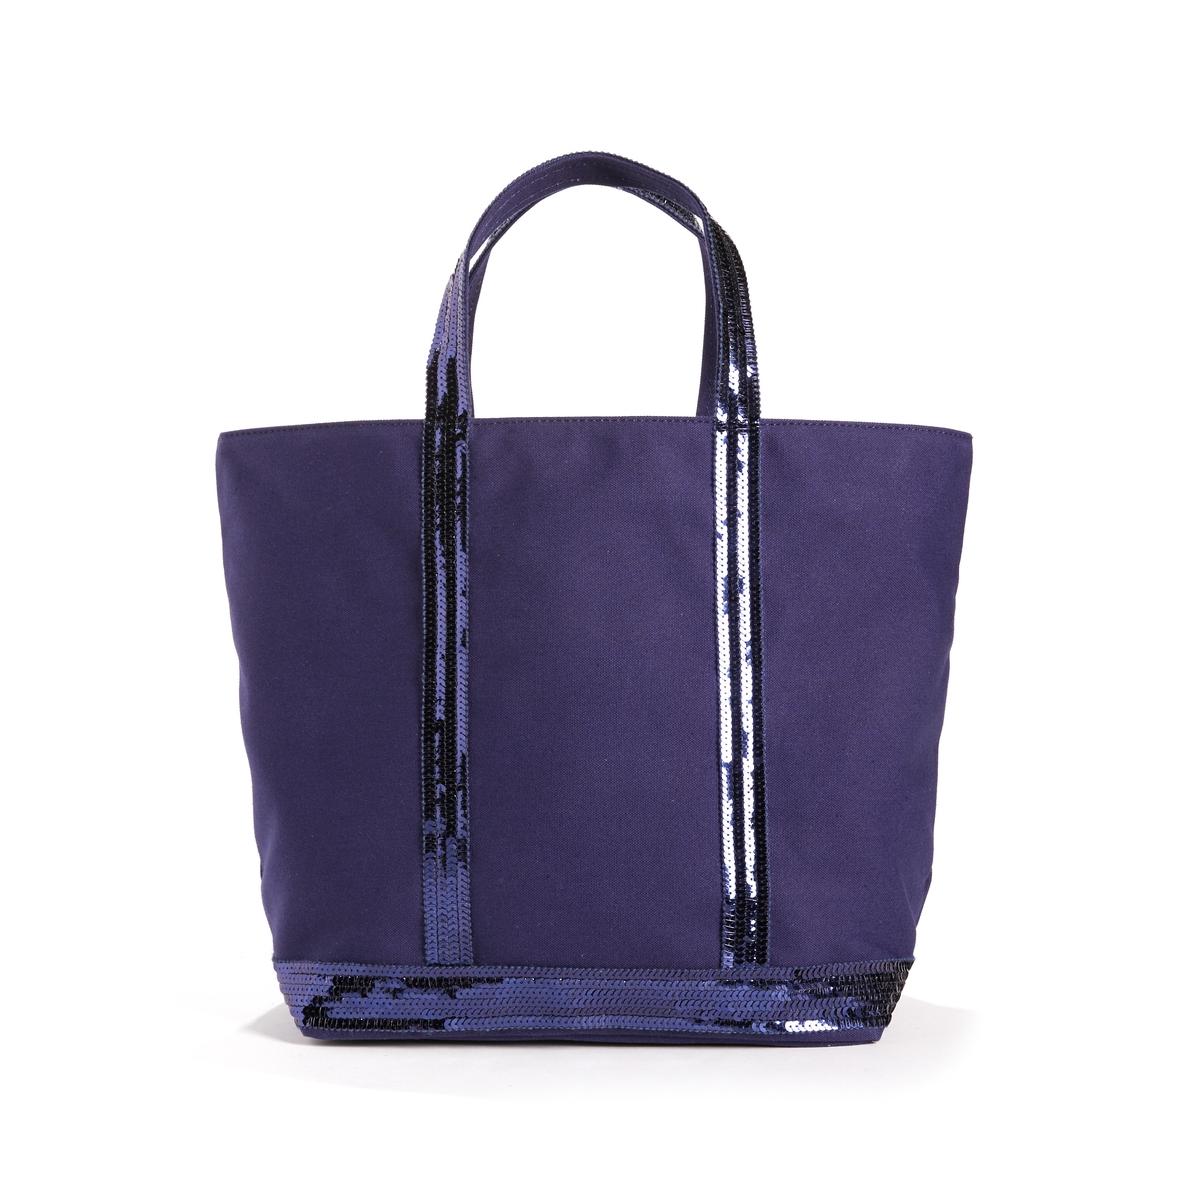 Фото - Сумка-шоппер La Redoute Средняя из ткани с блестками единый размер синий сумка шоппер средняя из парусины с блестками